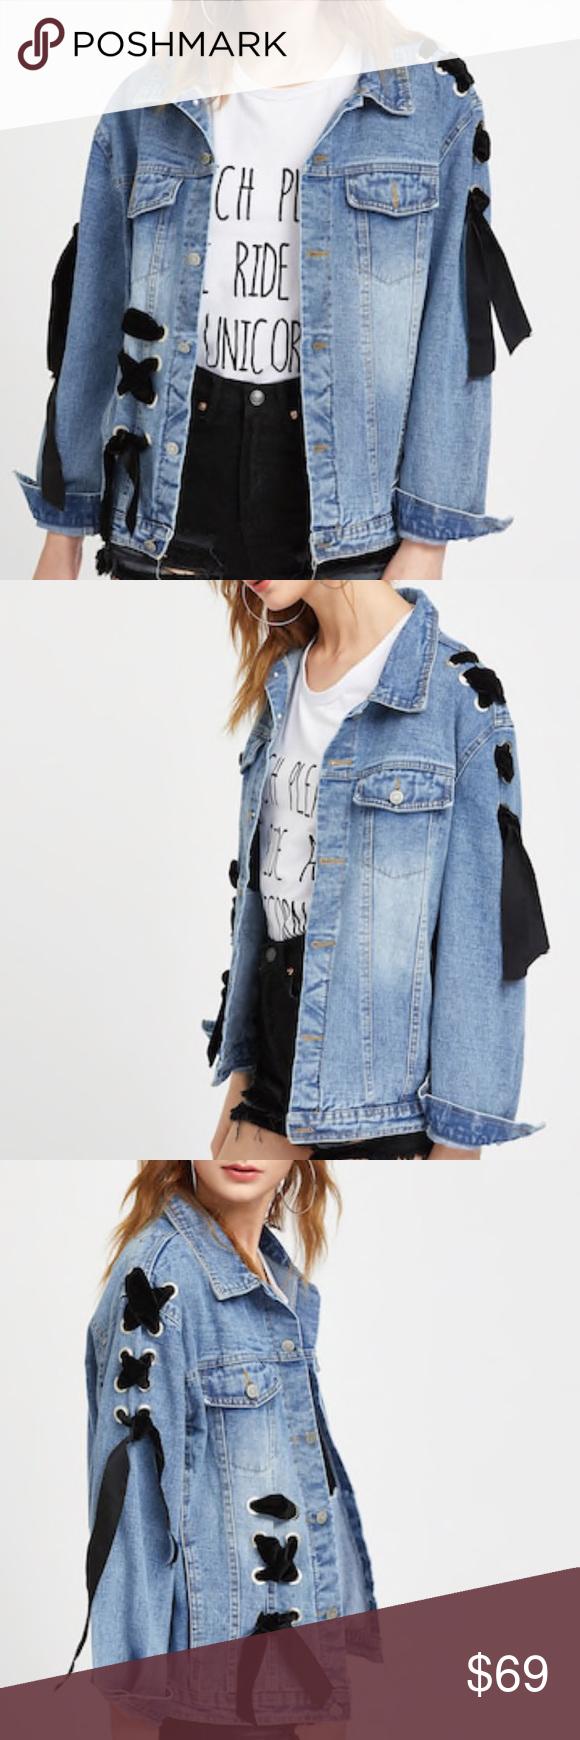 Hp Black Velvet Lace Up Denim Jacket Boutique Denim Decor Denim Jacket Classic Denim Jacket